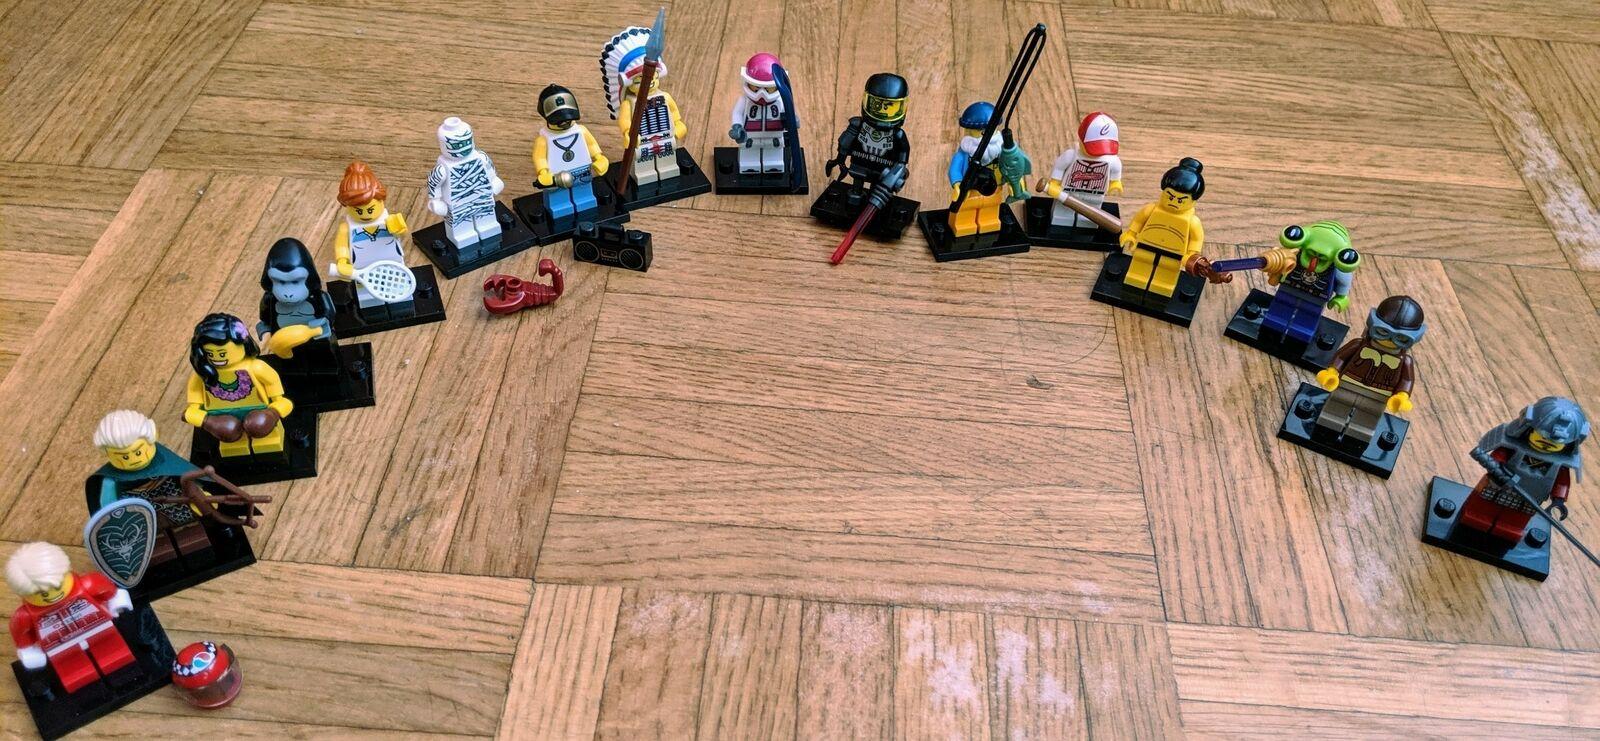 LEGO MINIFIGURES SERIE 3 COMPLETA-FULL 3 SERIES (16 MINIFIGS) 8803